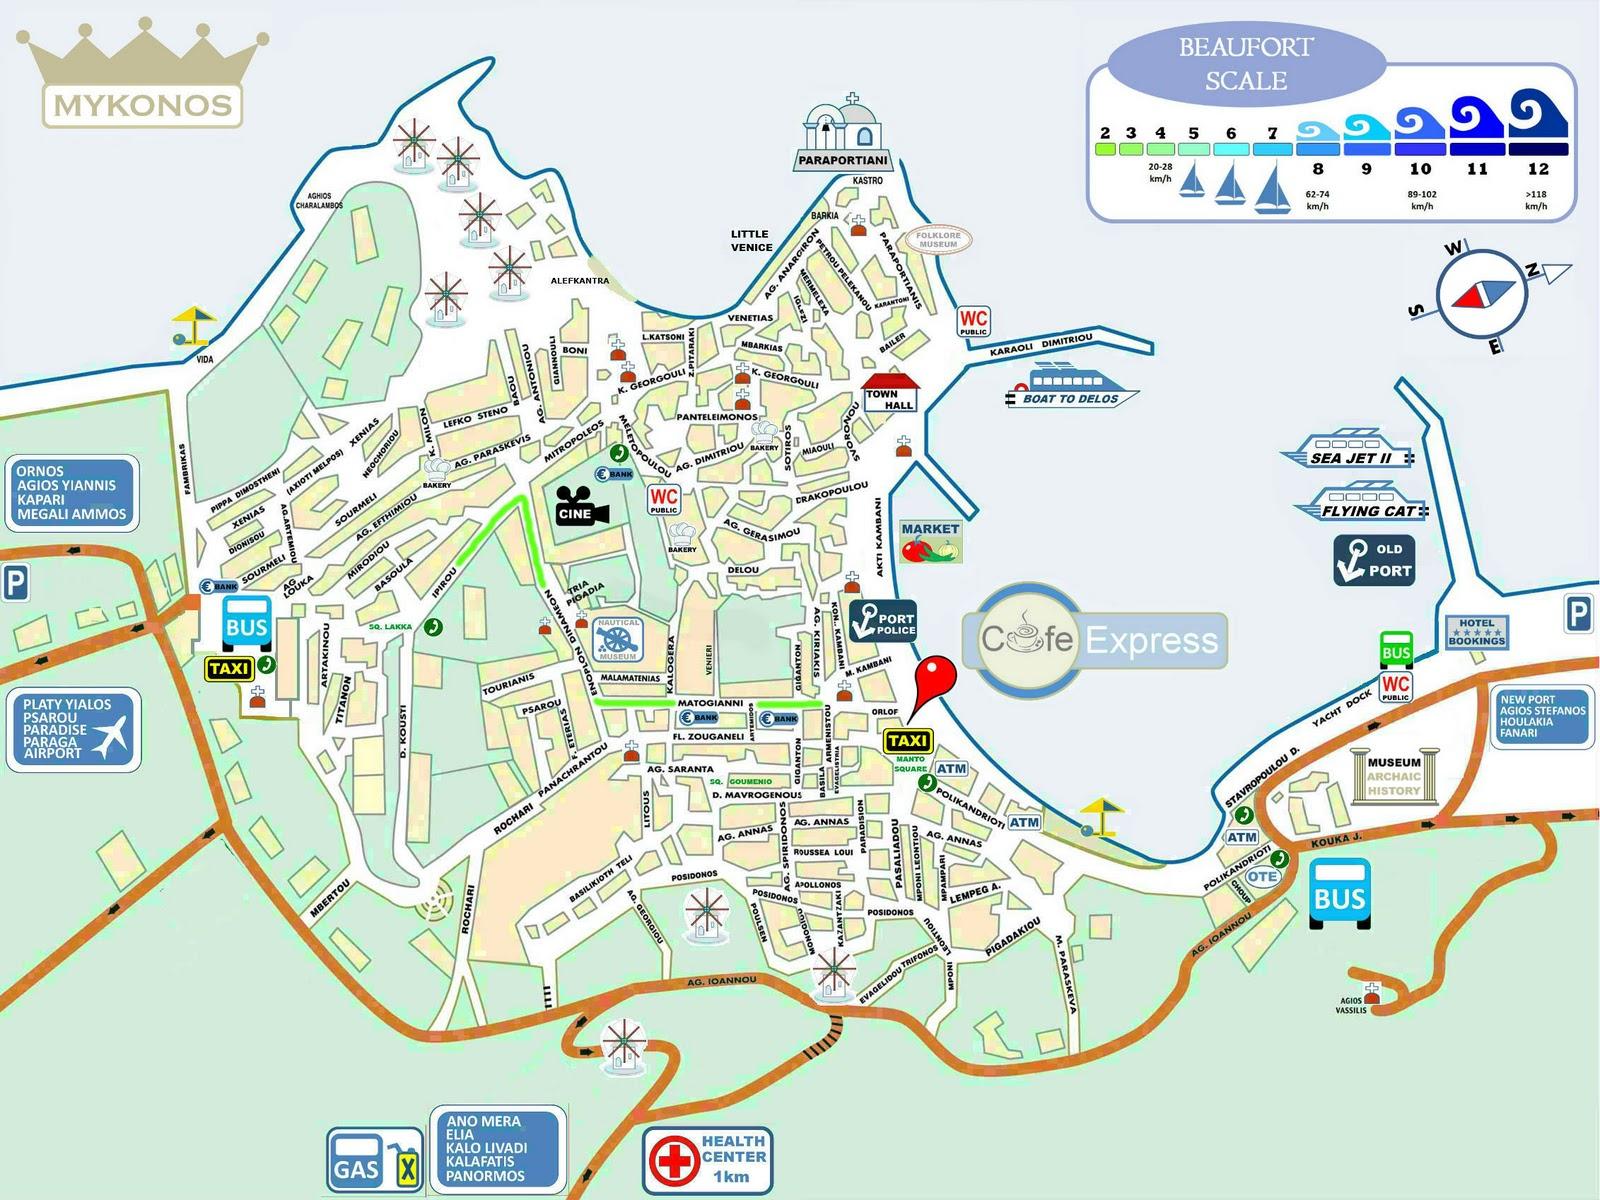 httpbpblogspotcomvdiizpgstownmap . mykonos santorini and athens in sep oct or nov  fodor's forum